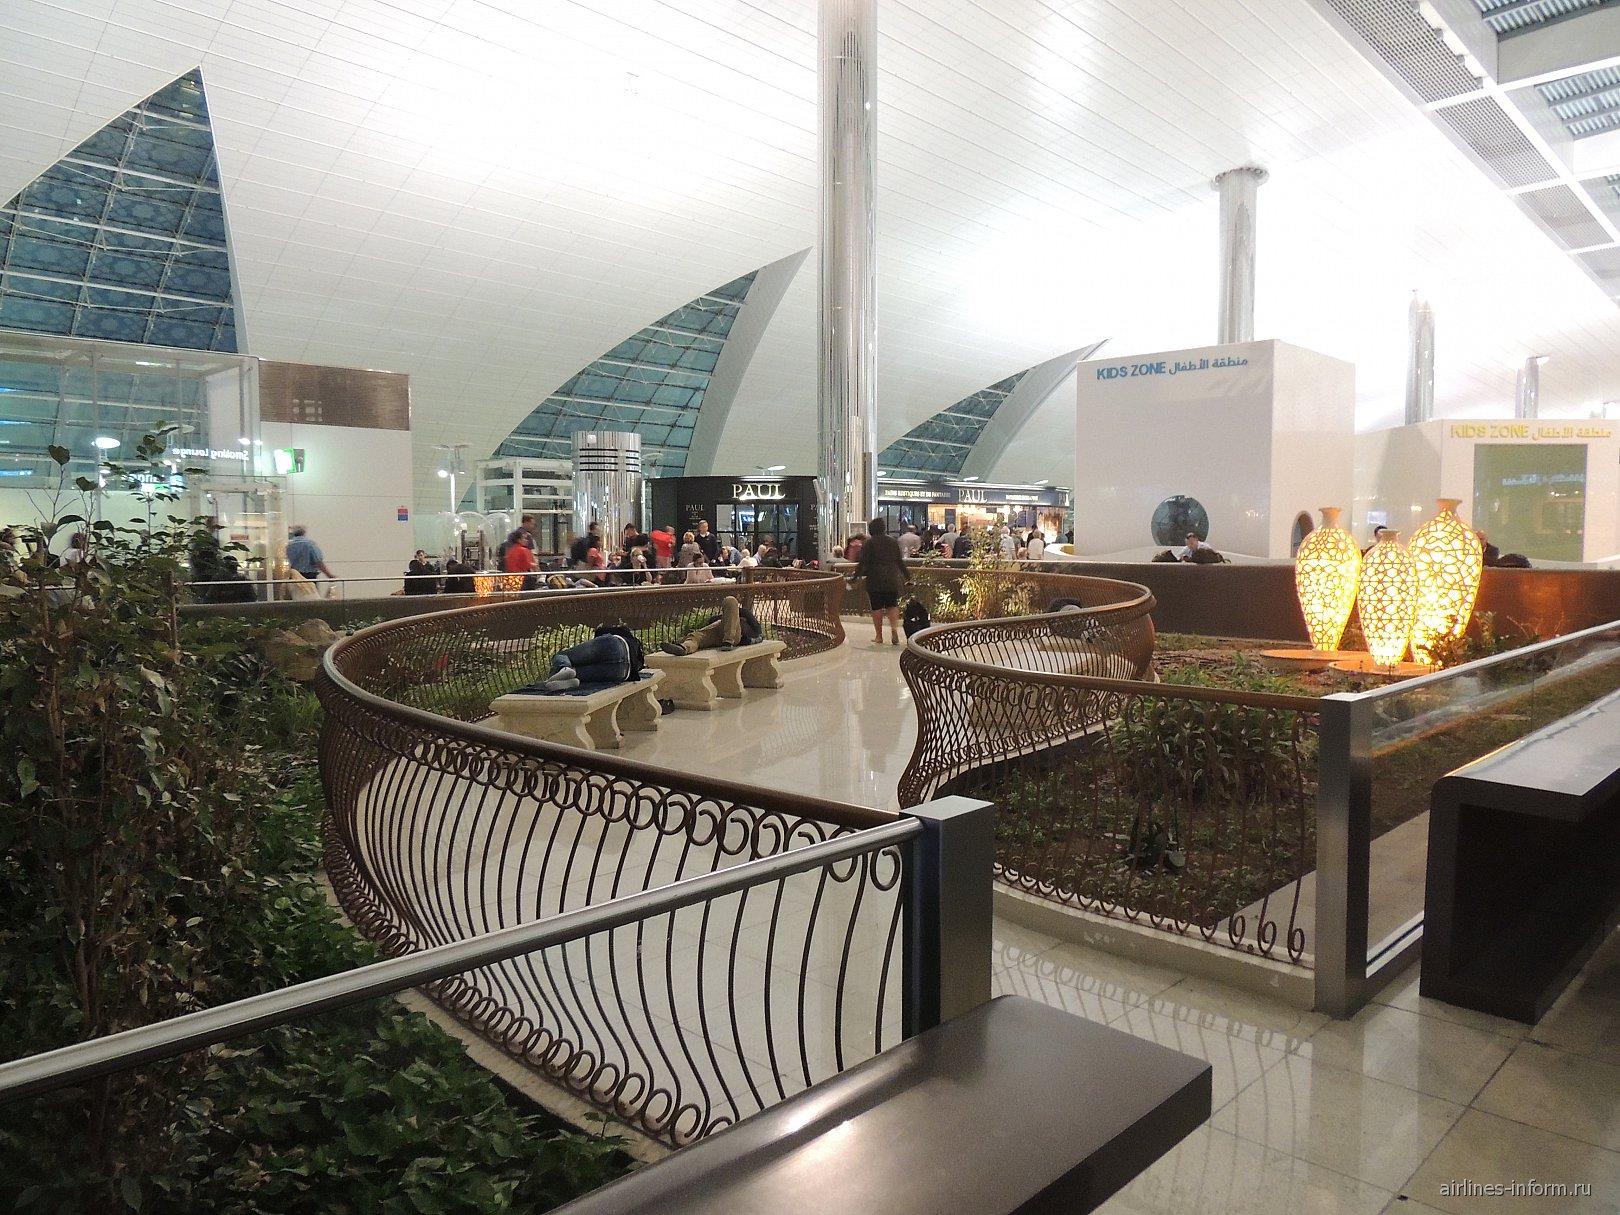 Зона отдыха в конкорсе B терминала 3 аэропорту Дубай